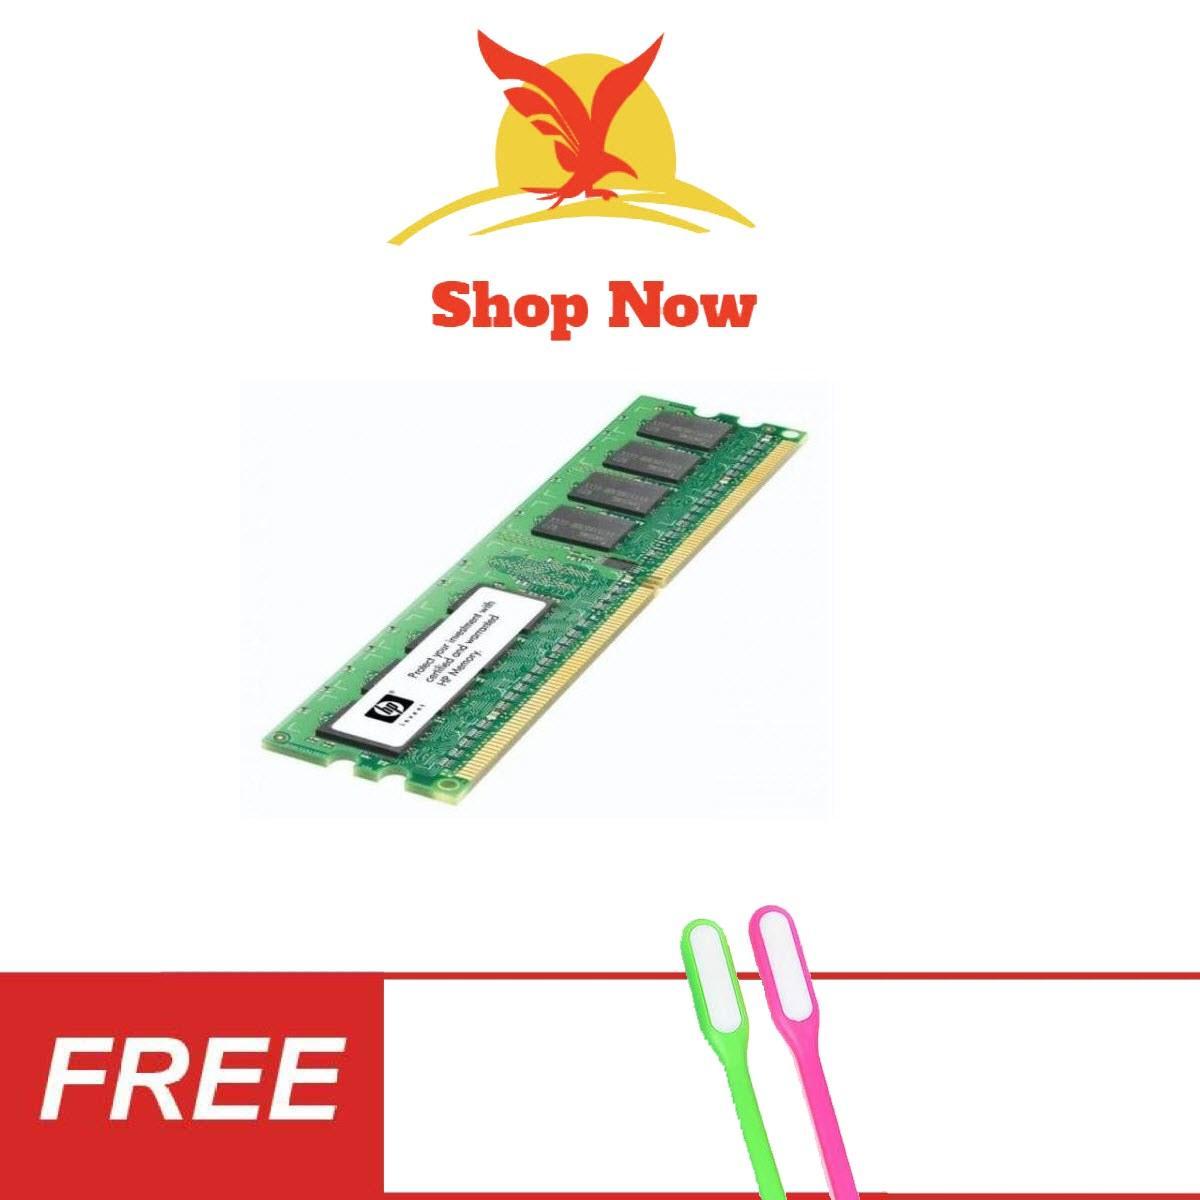 Ram Máy Tính Bàn DDR PC HP 4GB, DDR 3, Bus 1333Mhz